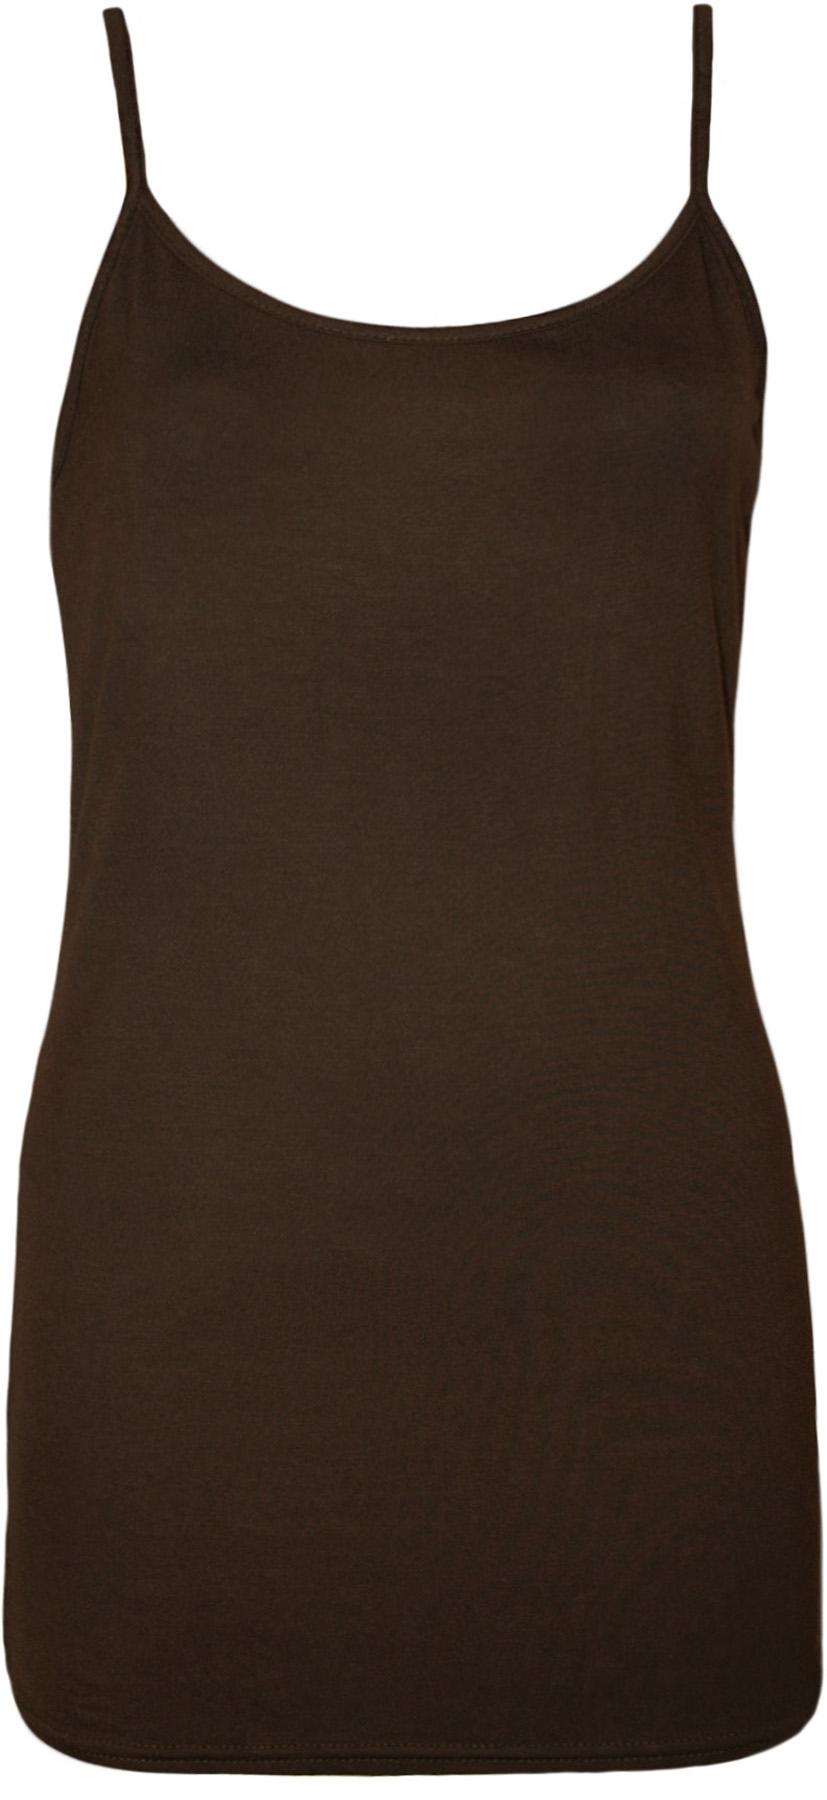 New-Womens-Strappy-Sleeveless-Ladies-Plain-Stretch-Cami-Vest-Top-8-14